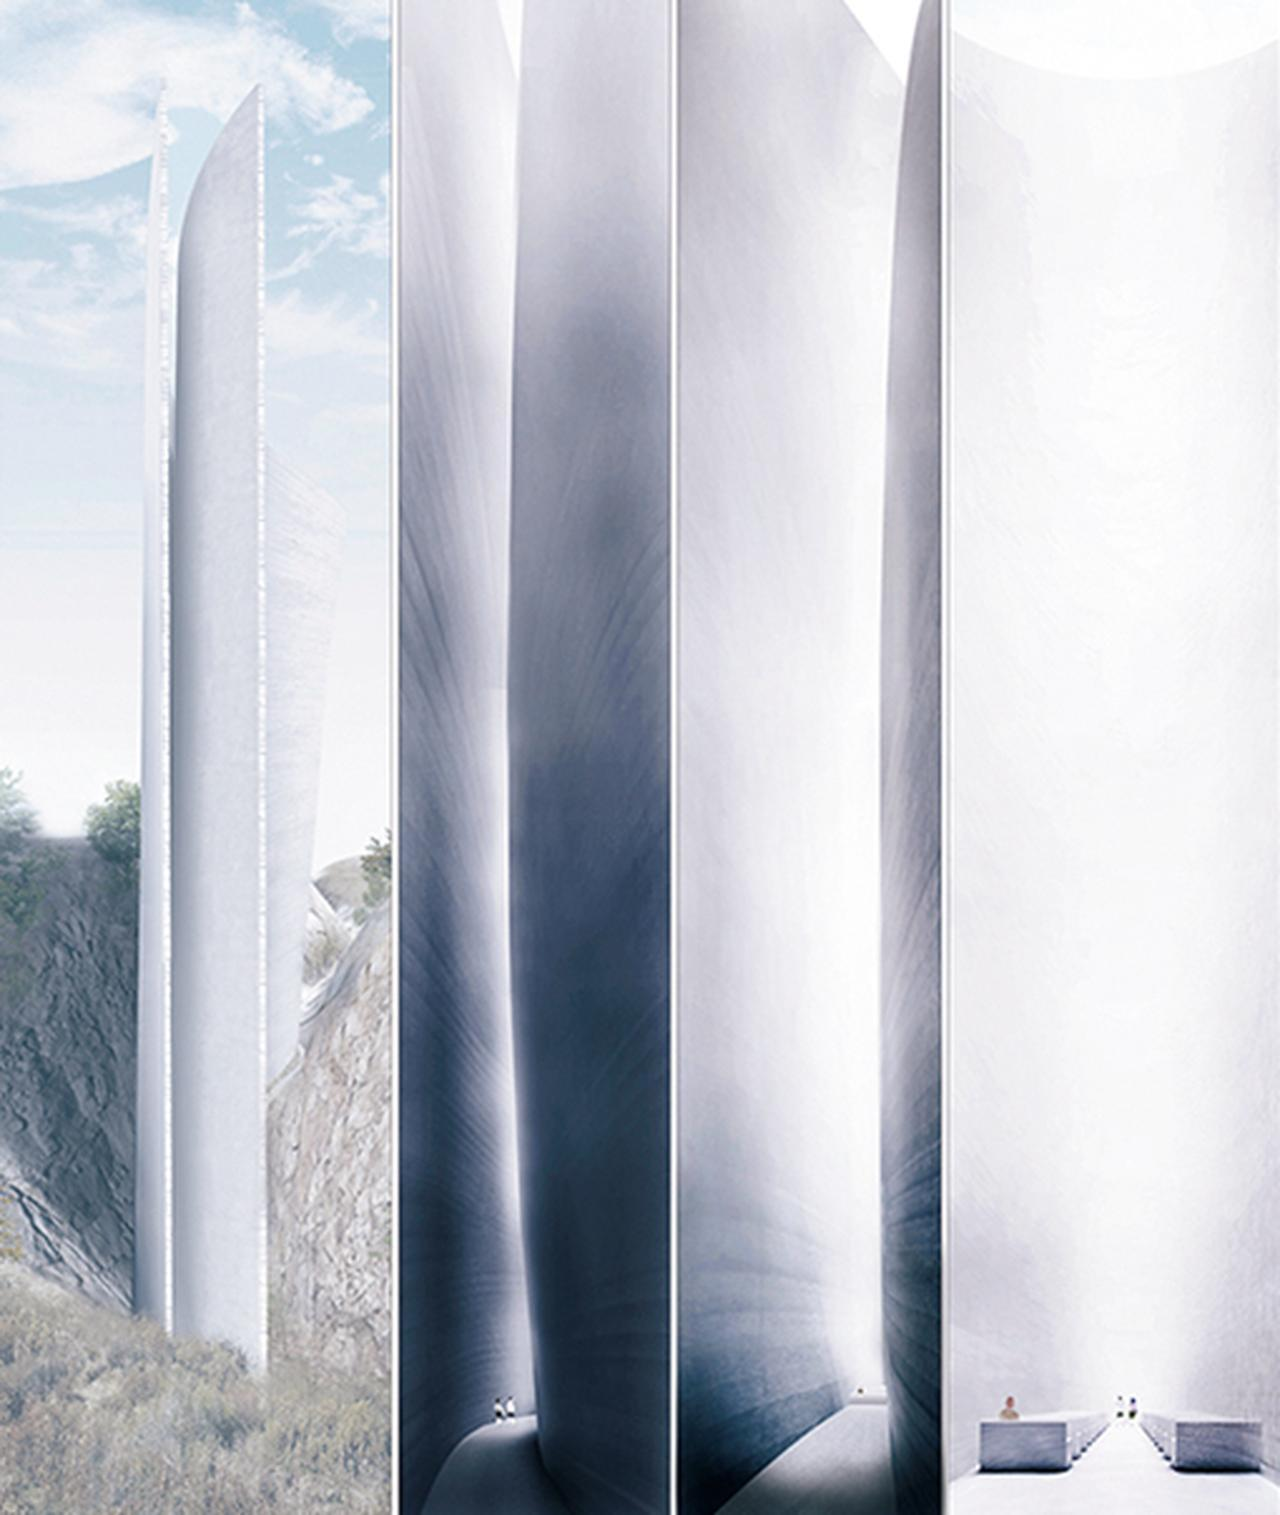 Images : 2番目の画像 - 「建築界、アート界が注目する 石上純也の個展が、  カルティエ現代美術財団で開催」のアルバム - T JAPAN:The New York Times Style Magazine 公式サイト